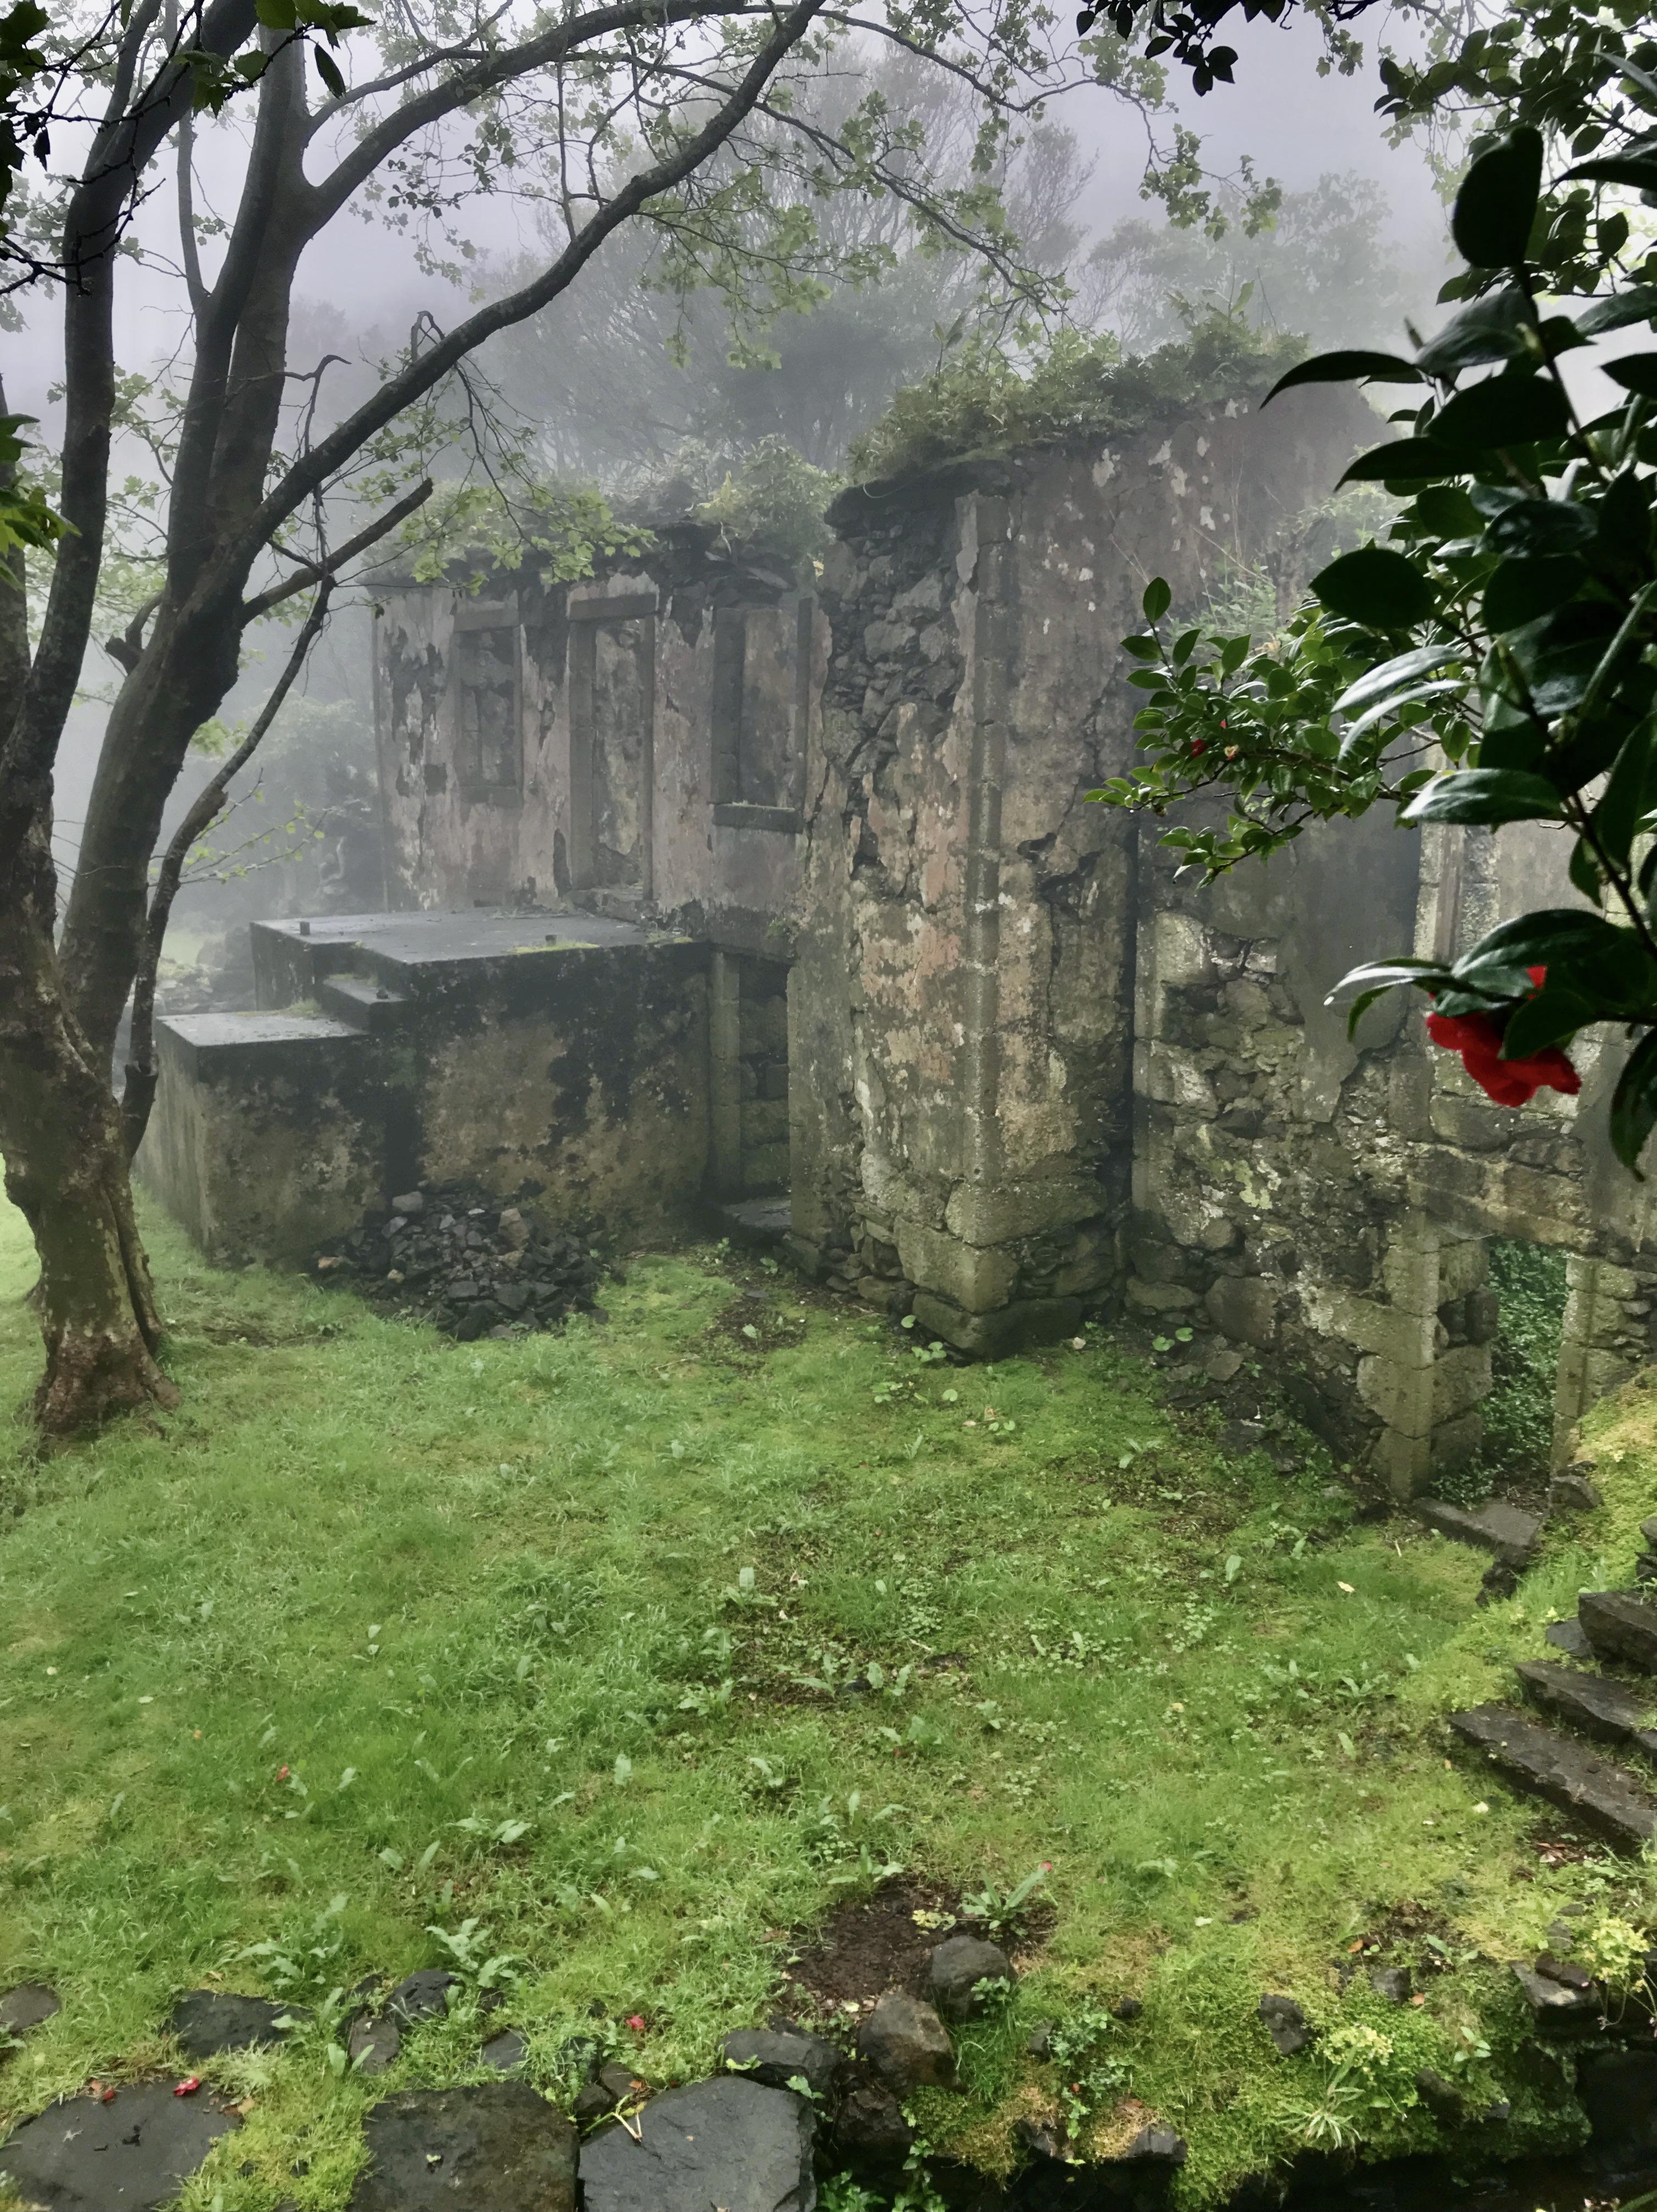 Casa dos Figos Maduros under mist